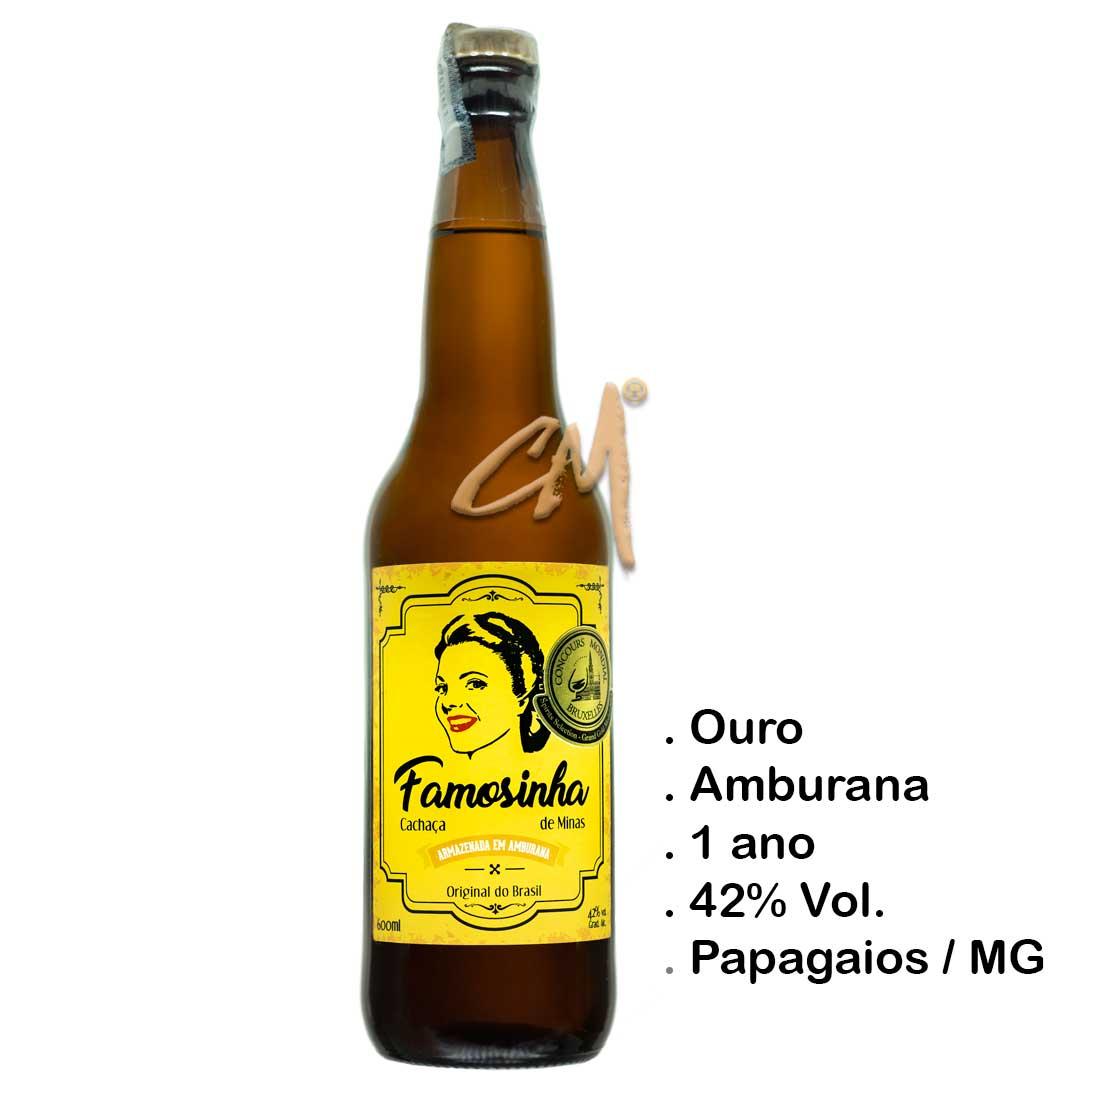 Cachaça Famosinha de Minas 600 ml (Papagaios - MG)